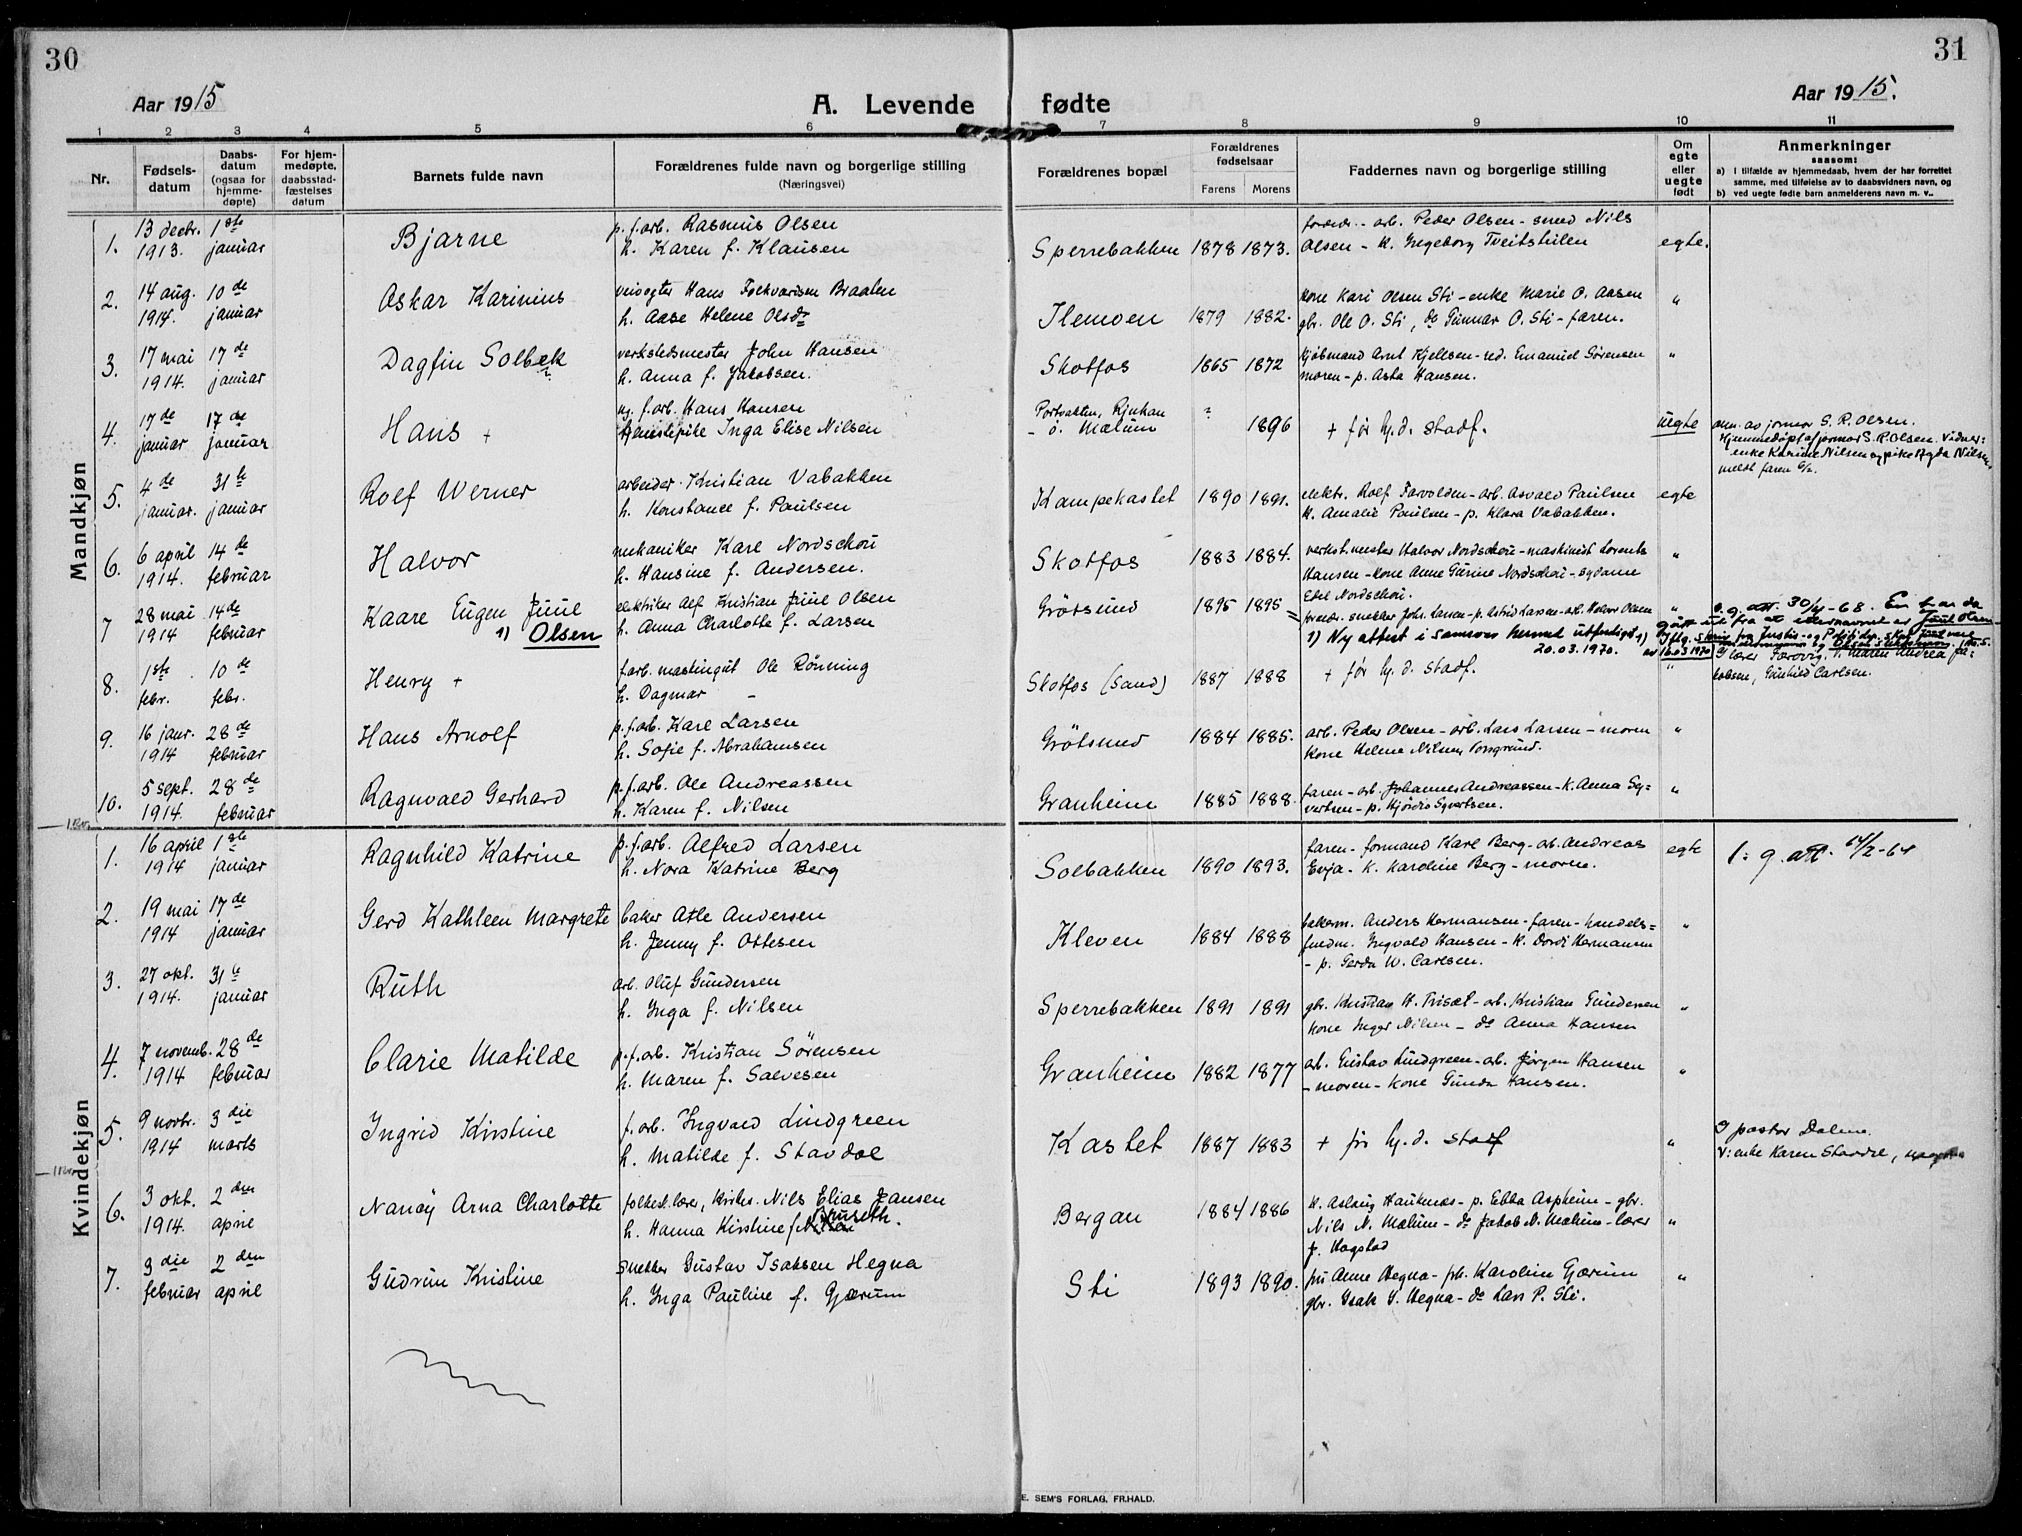 SAKO, Solum kirkebøker, F/Fb/L0004: Ministerialbok nr. II 4, 1913-1924, s. 30-31